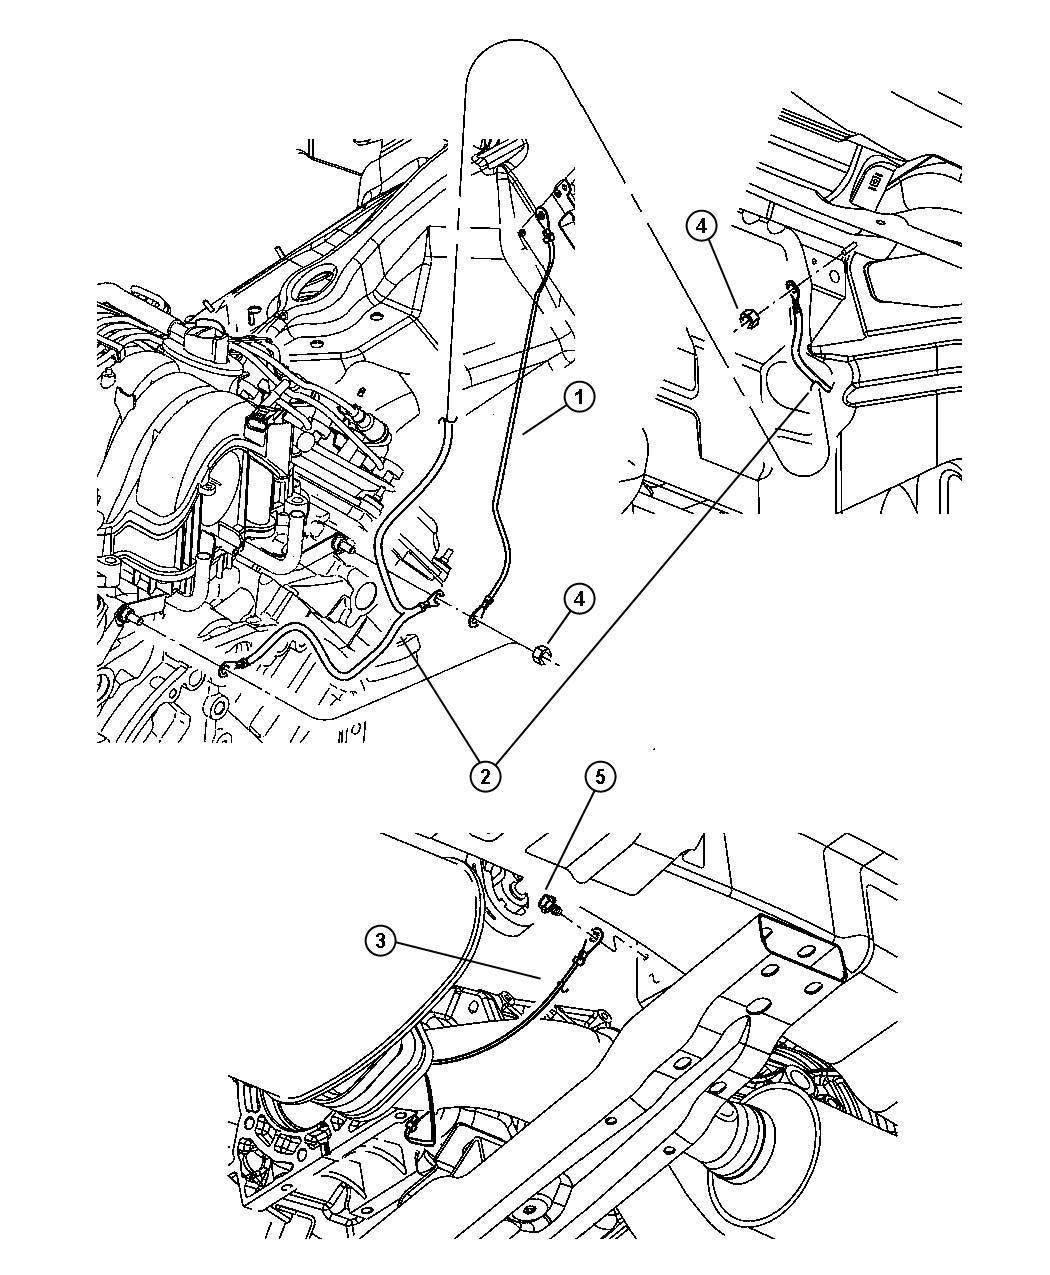 Jeep Grand Cherokee Strap. Ground. Engine to ngc, ngc to